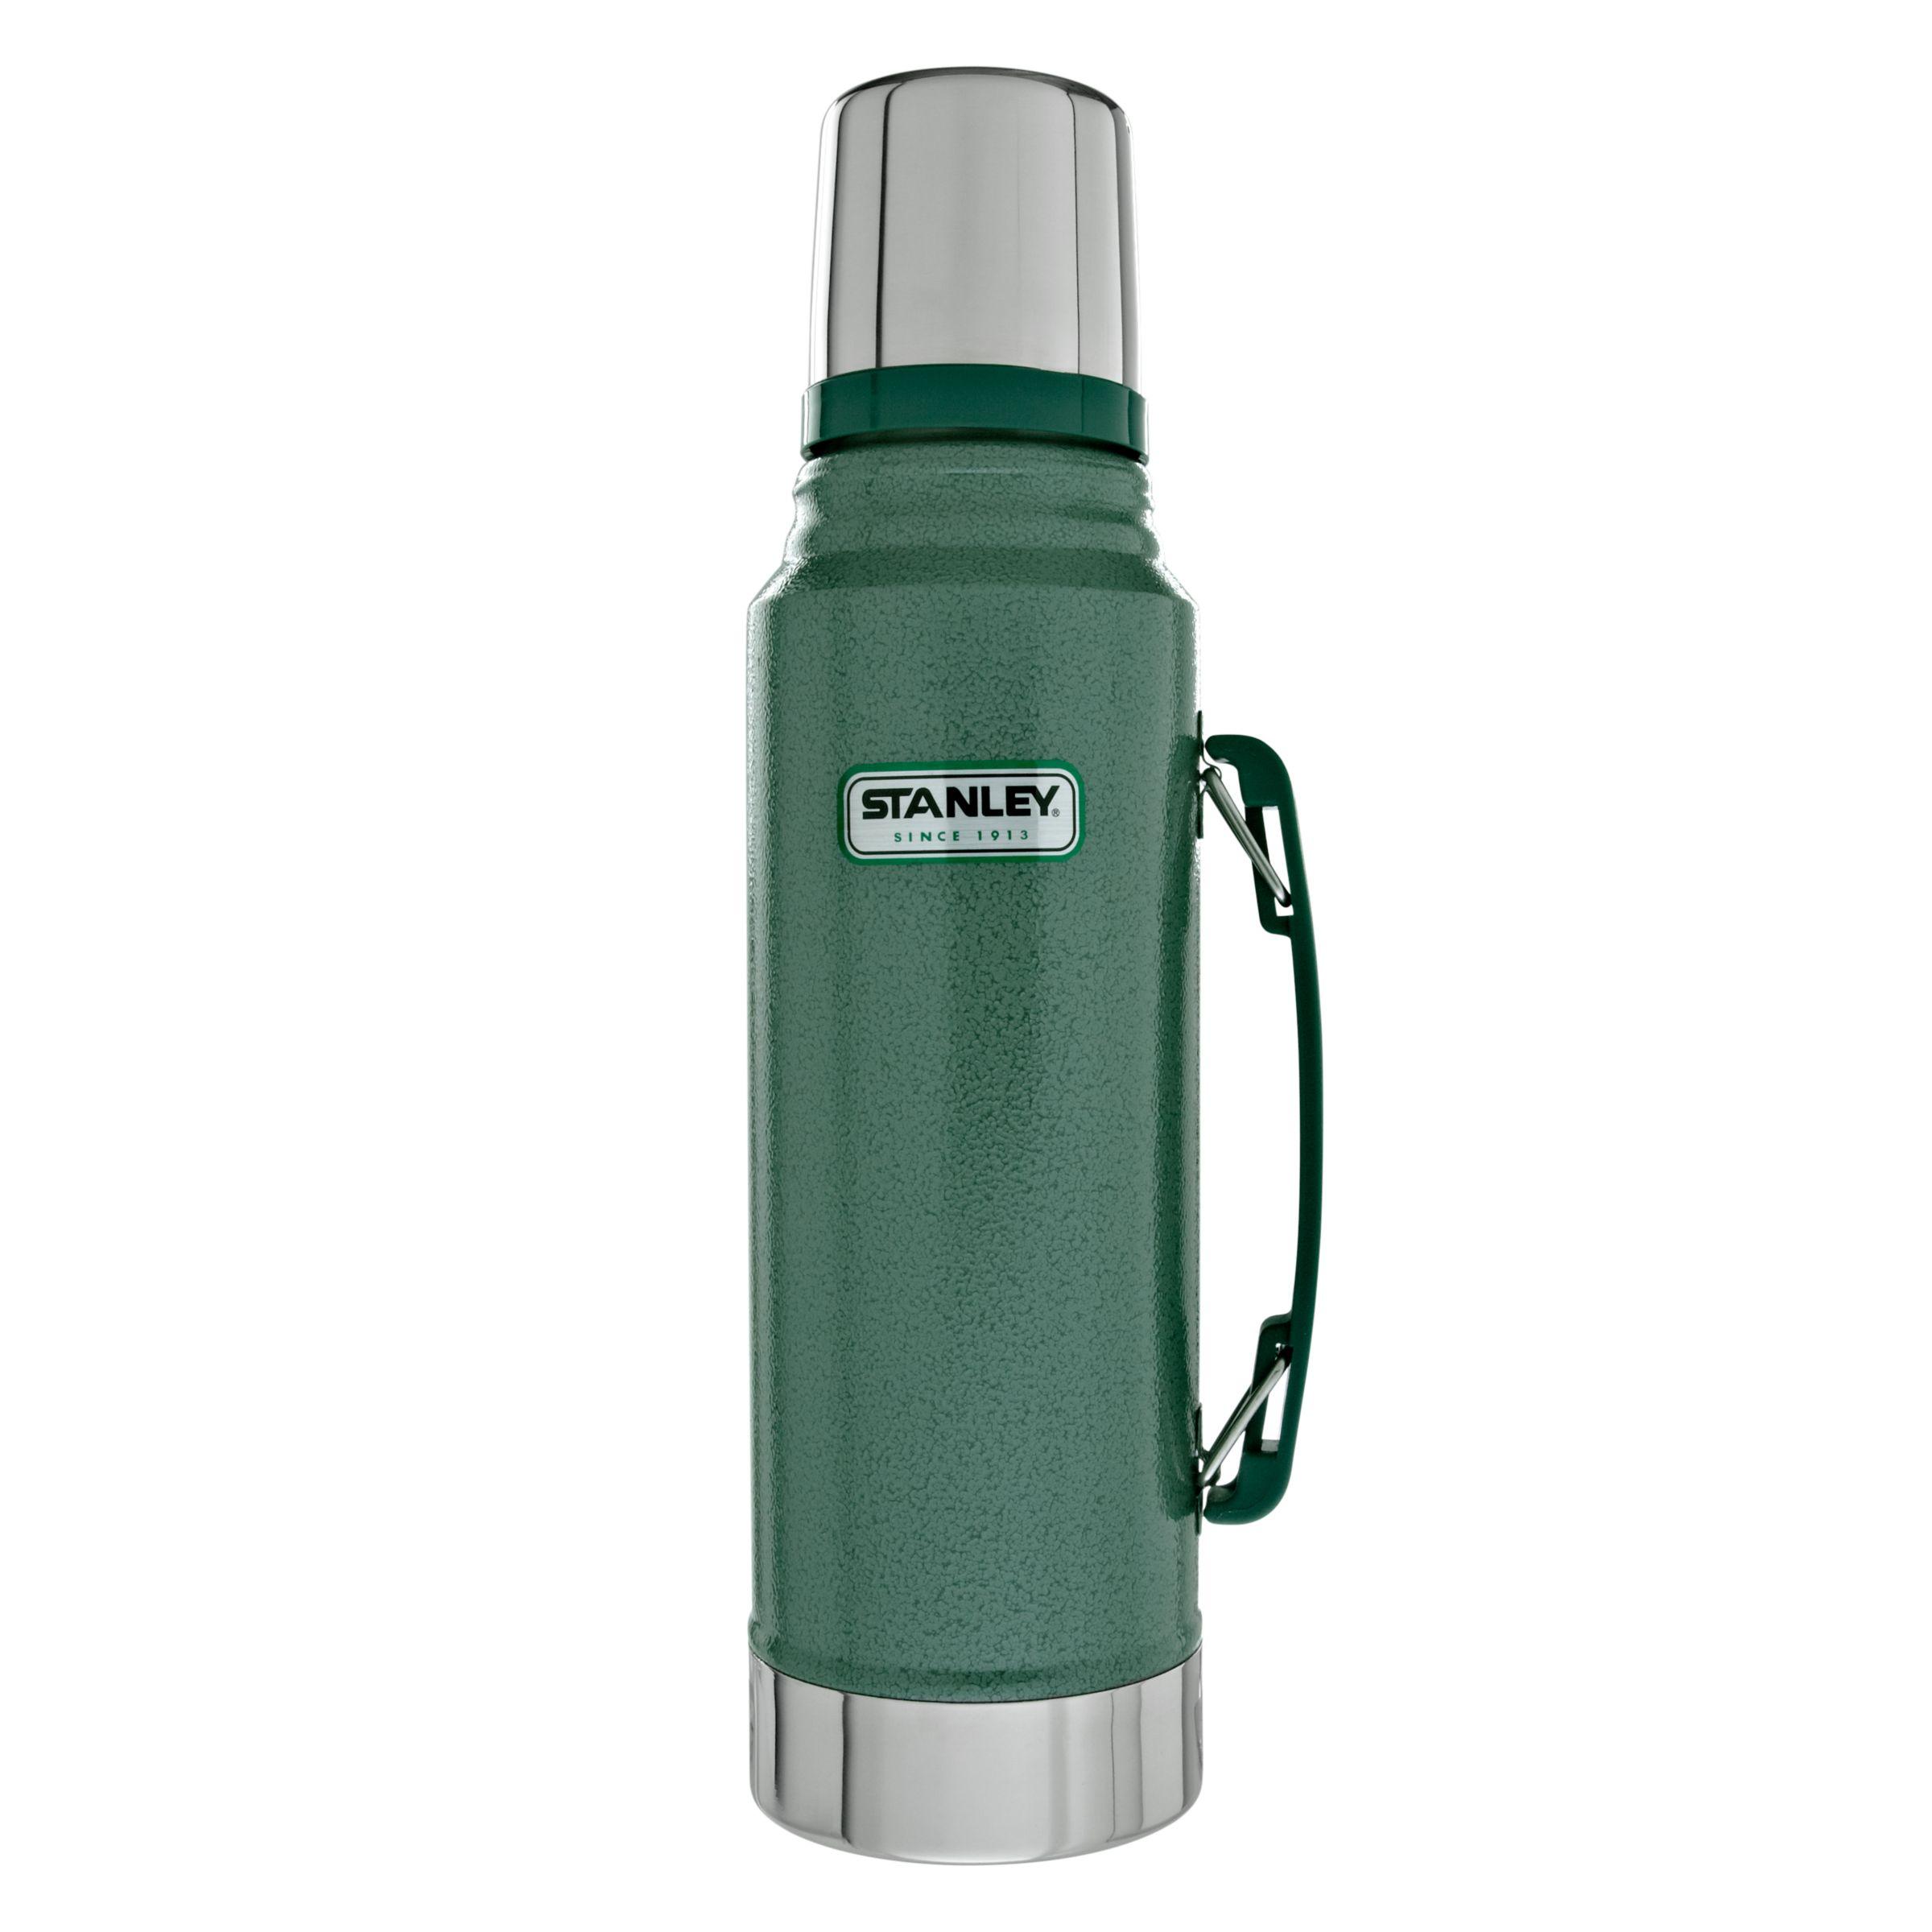 Stanley Stanley Classic Vacuum Flask, Hammertone Green, 1L